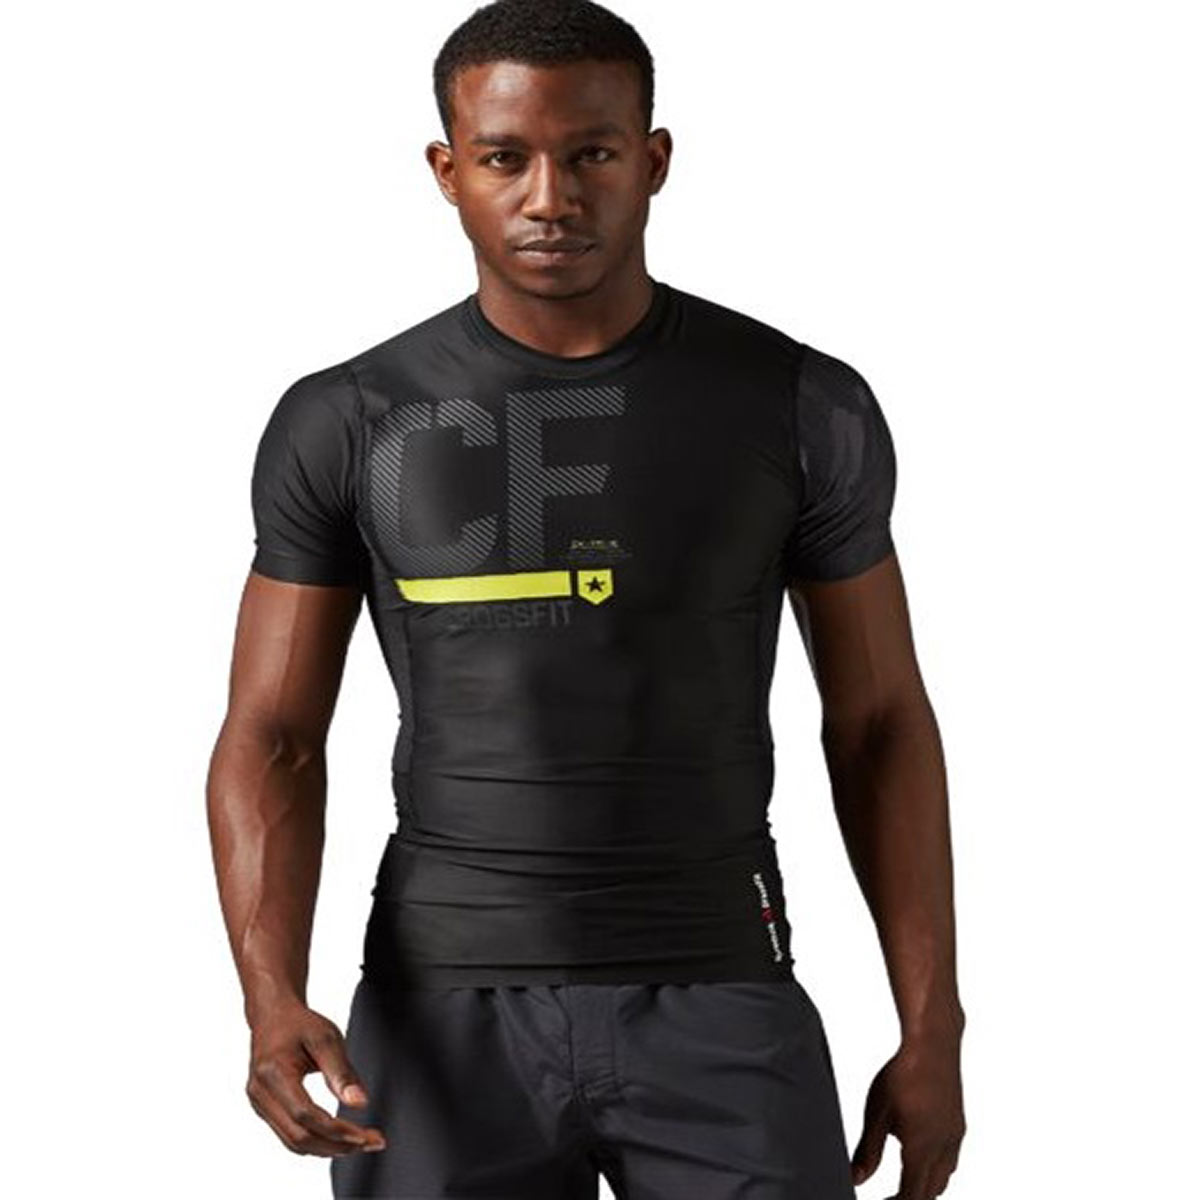 Reebok Crossfit Compression - Running tops for Men - Black  d0cdd425c